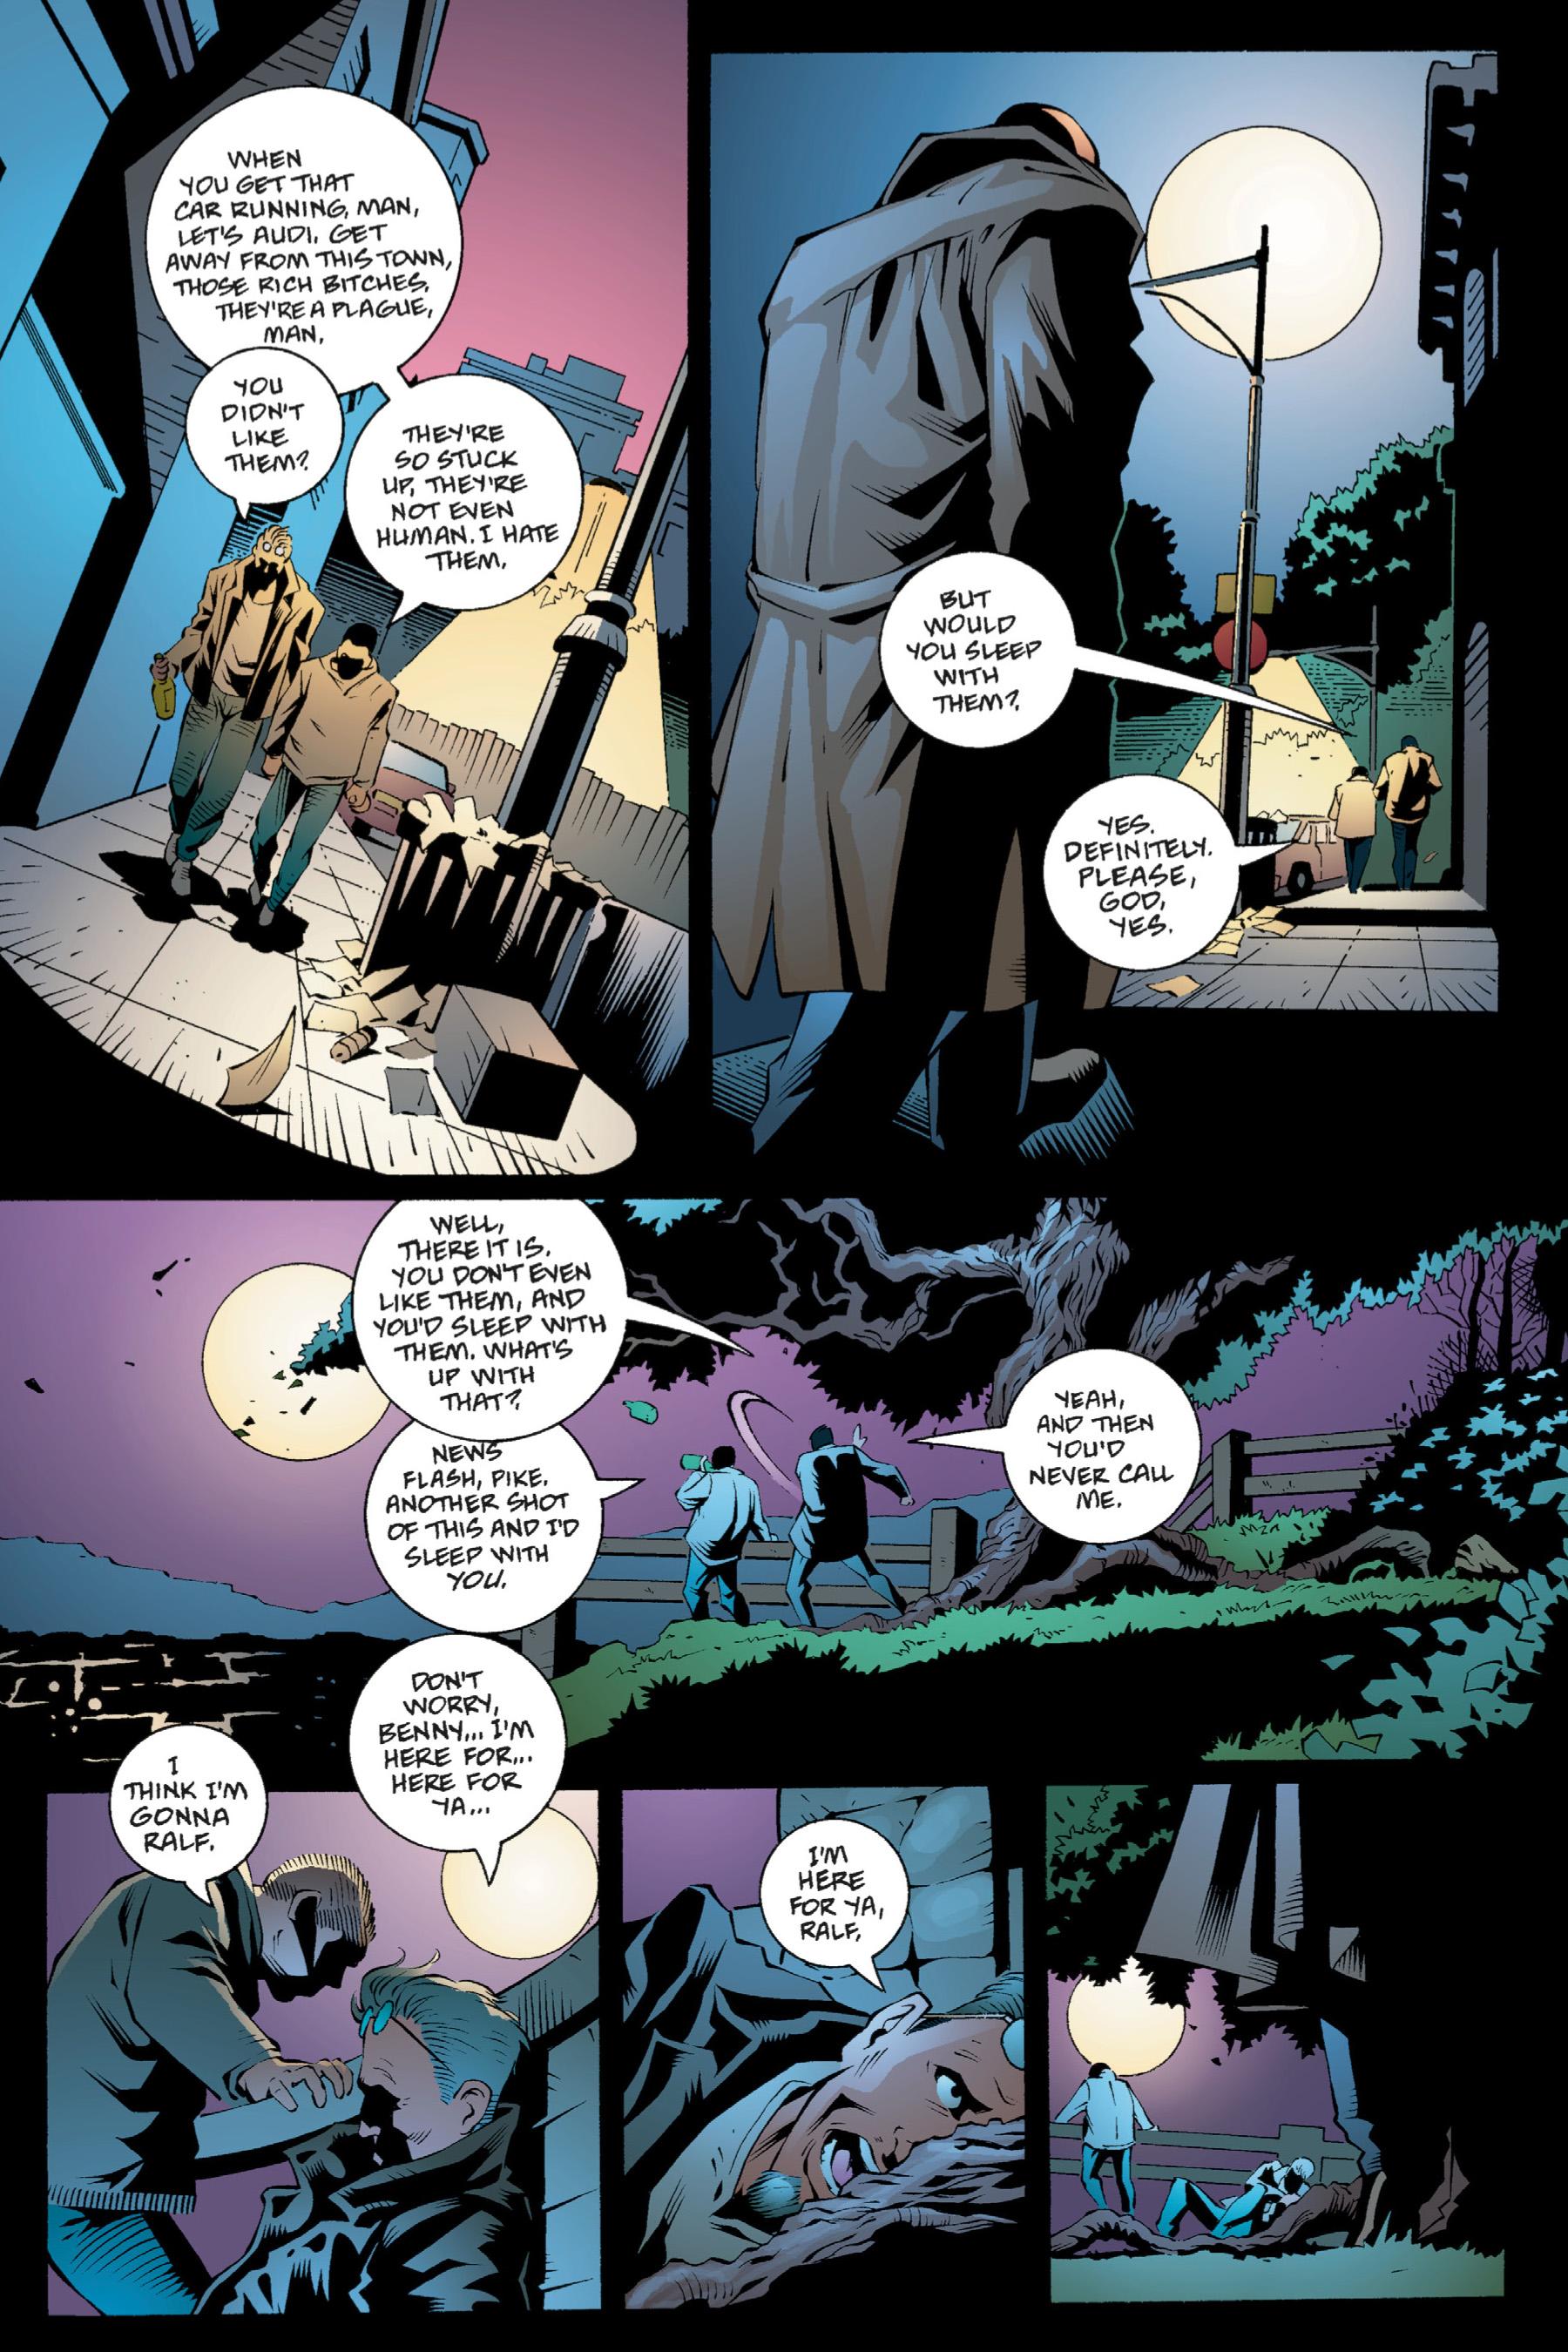 Read online Buffy the Vampire Slayer: Omnibus comic -  Issue # TPB 1 - 49